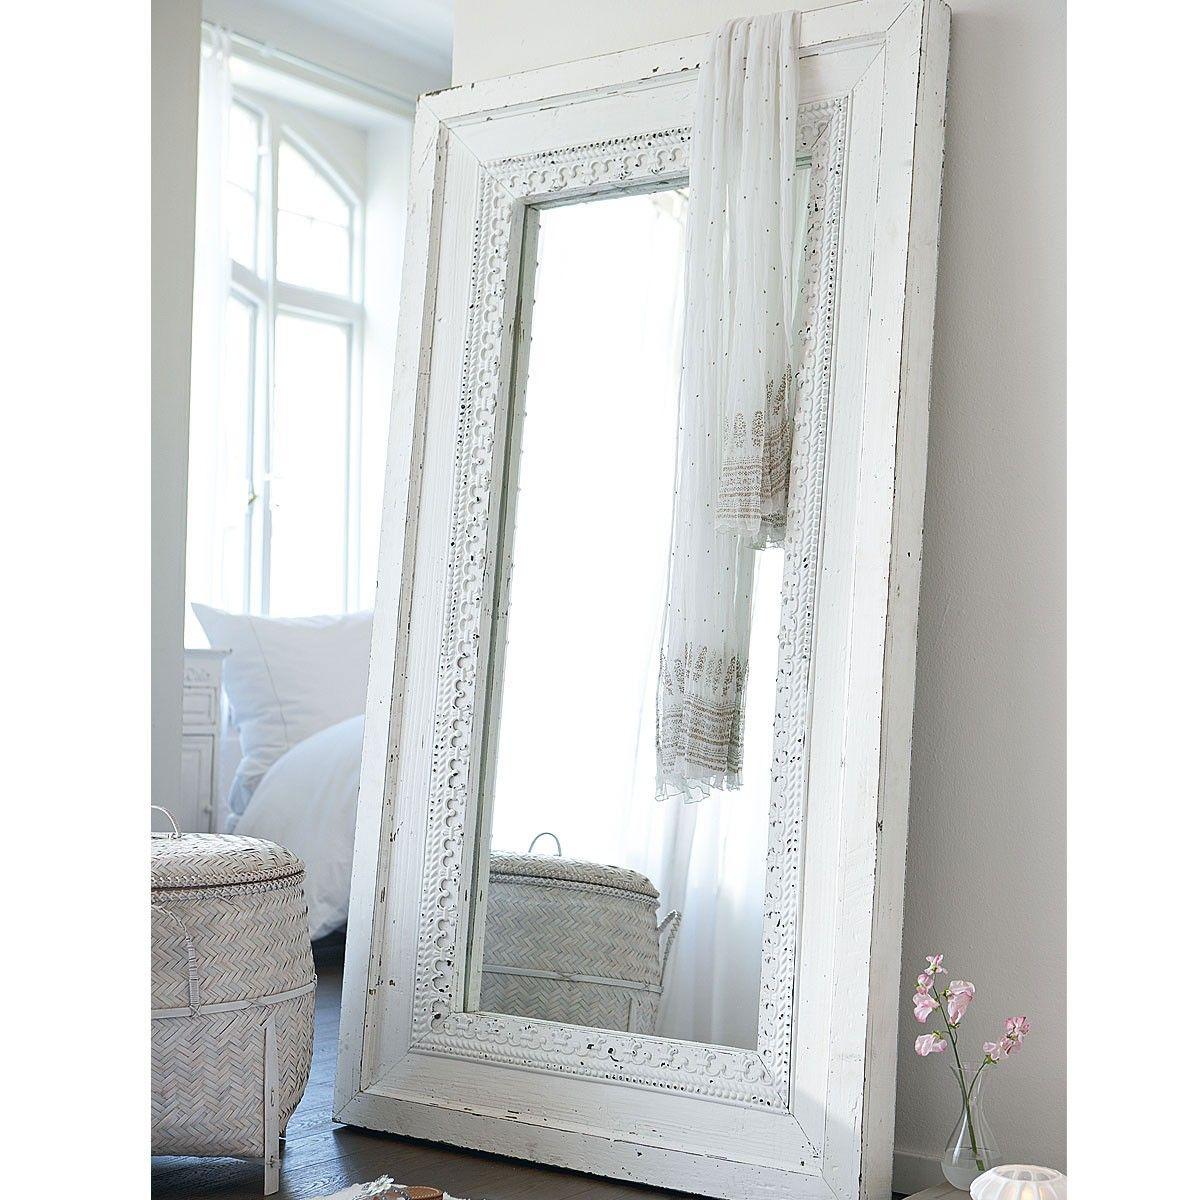 Spiegel Holz Weiss Spiegel Weiss Antike Spiegel Spiegel Holz